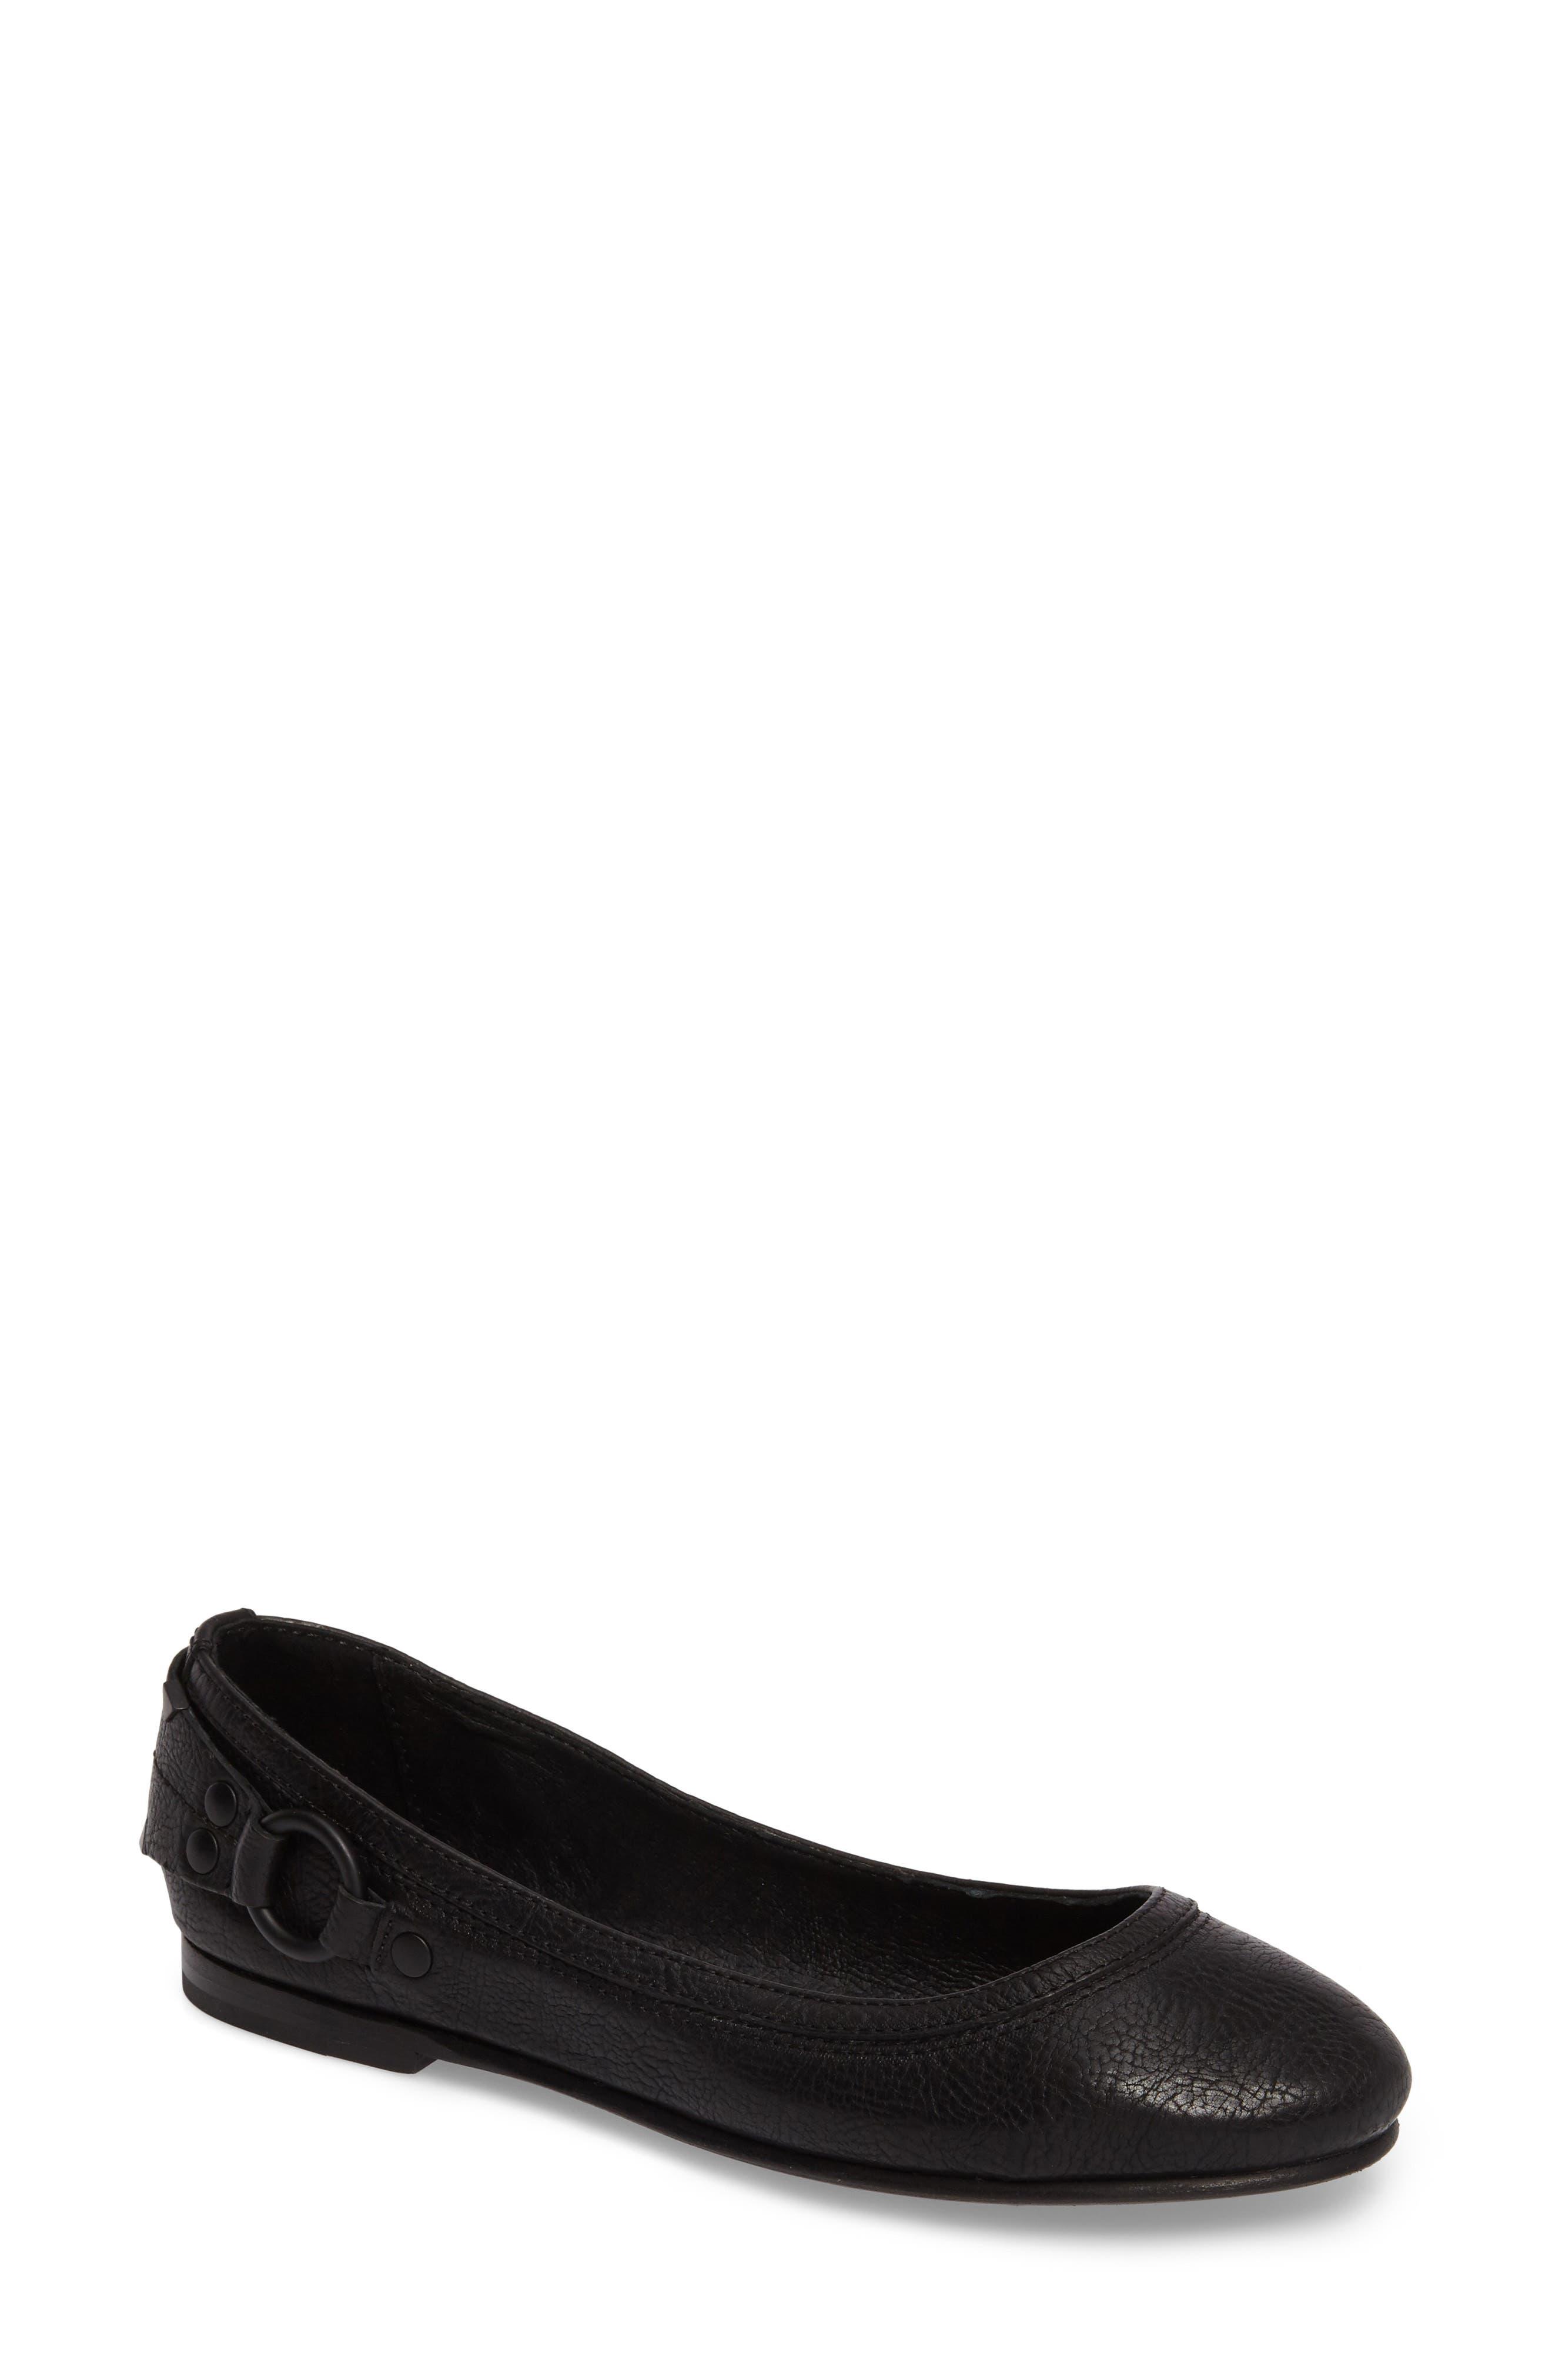 'Carson Stud' Flat,                         Main,                         color, Black